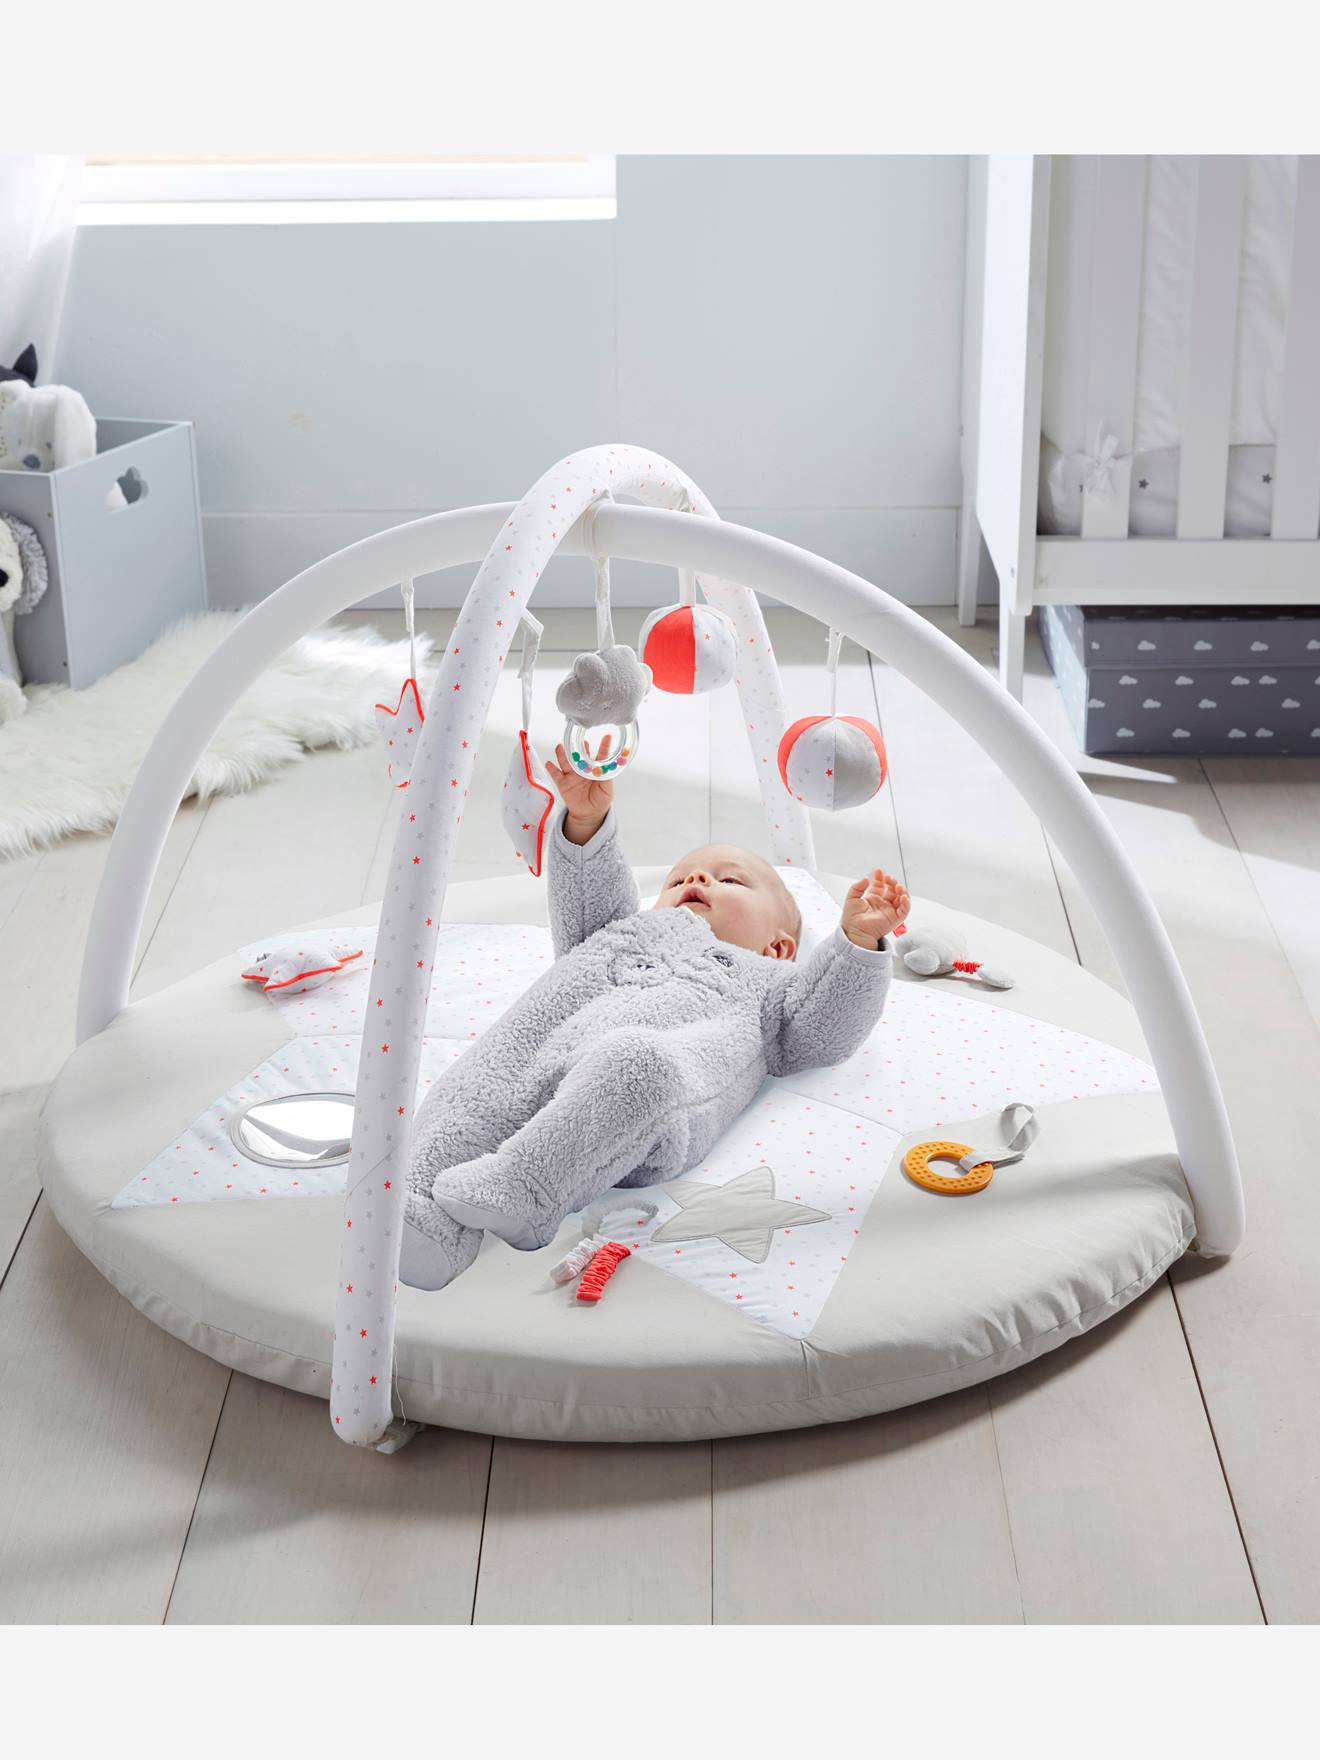 stunning tapis duveil pluie dutoiles blanc imprim vertbaudet enfant with tapis nuage blanc. Black Bedroom Furniture Sets. Home Design Ideas